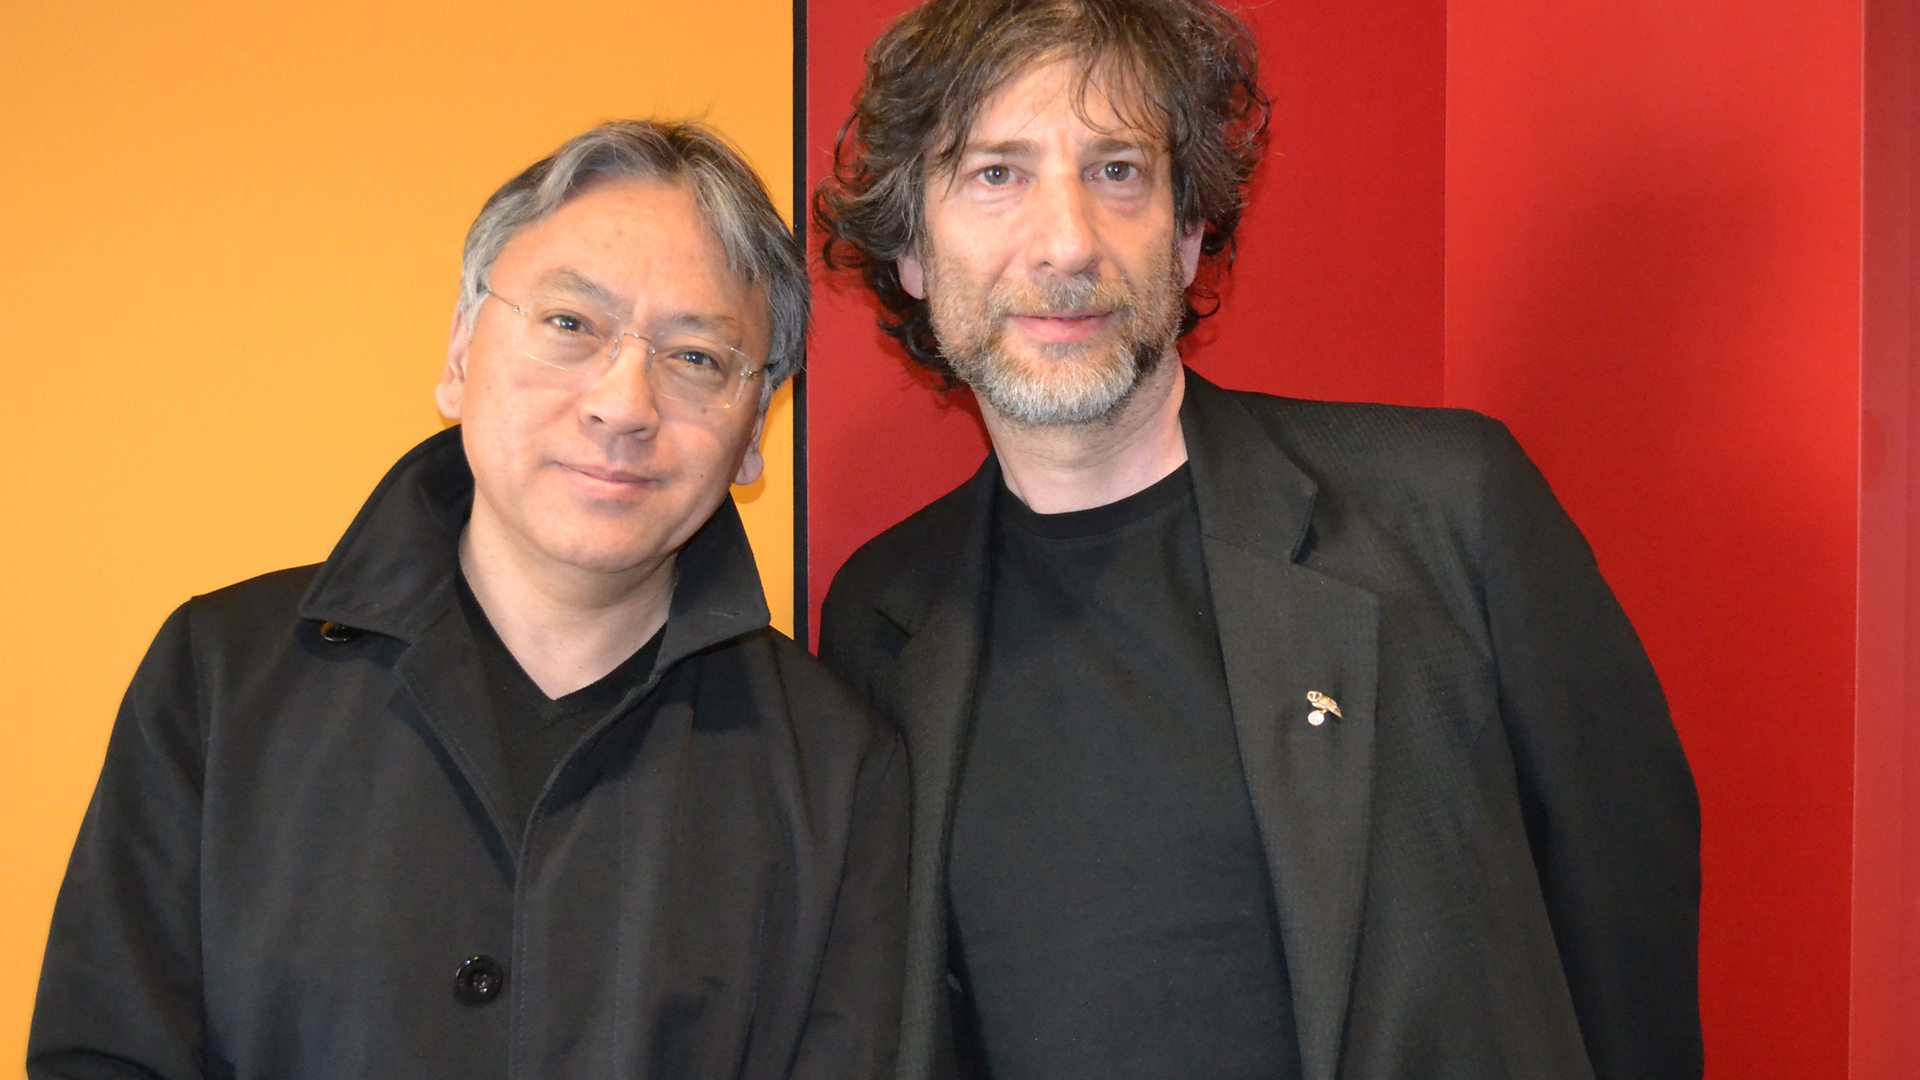 2015, Novelists Kazuo Ishiguro And Neil Gaiman  Debate